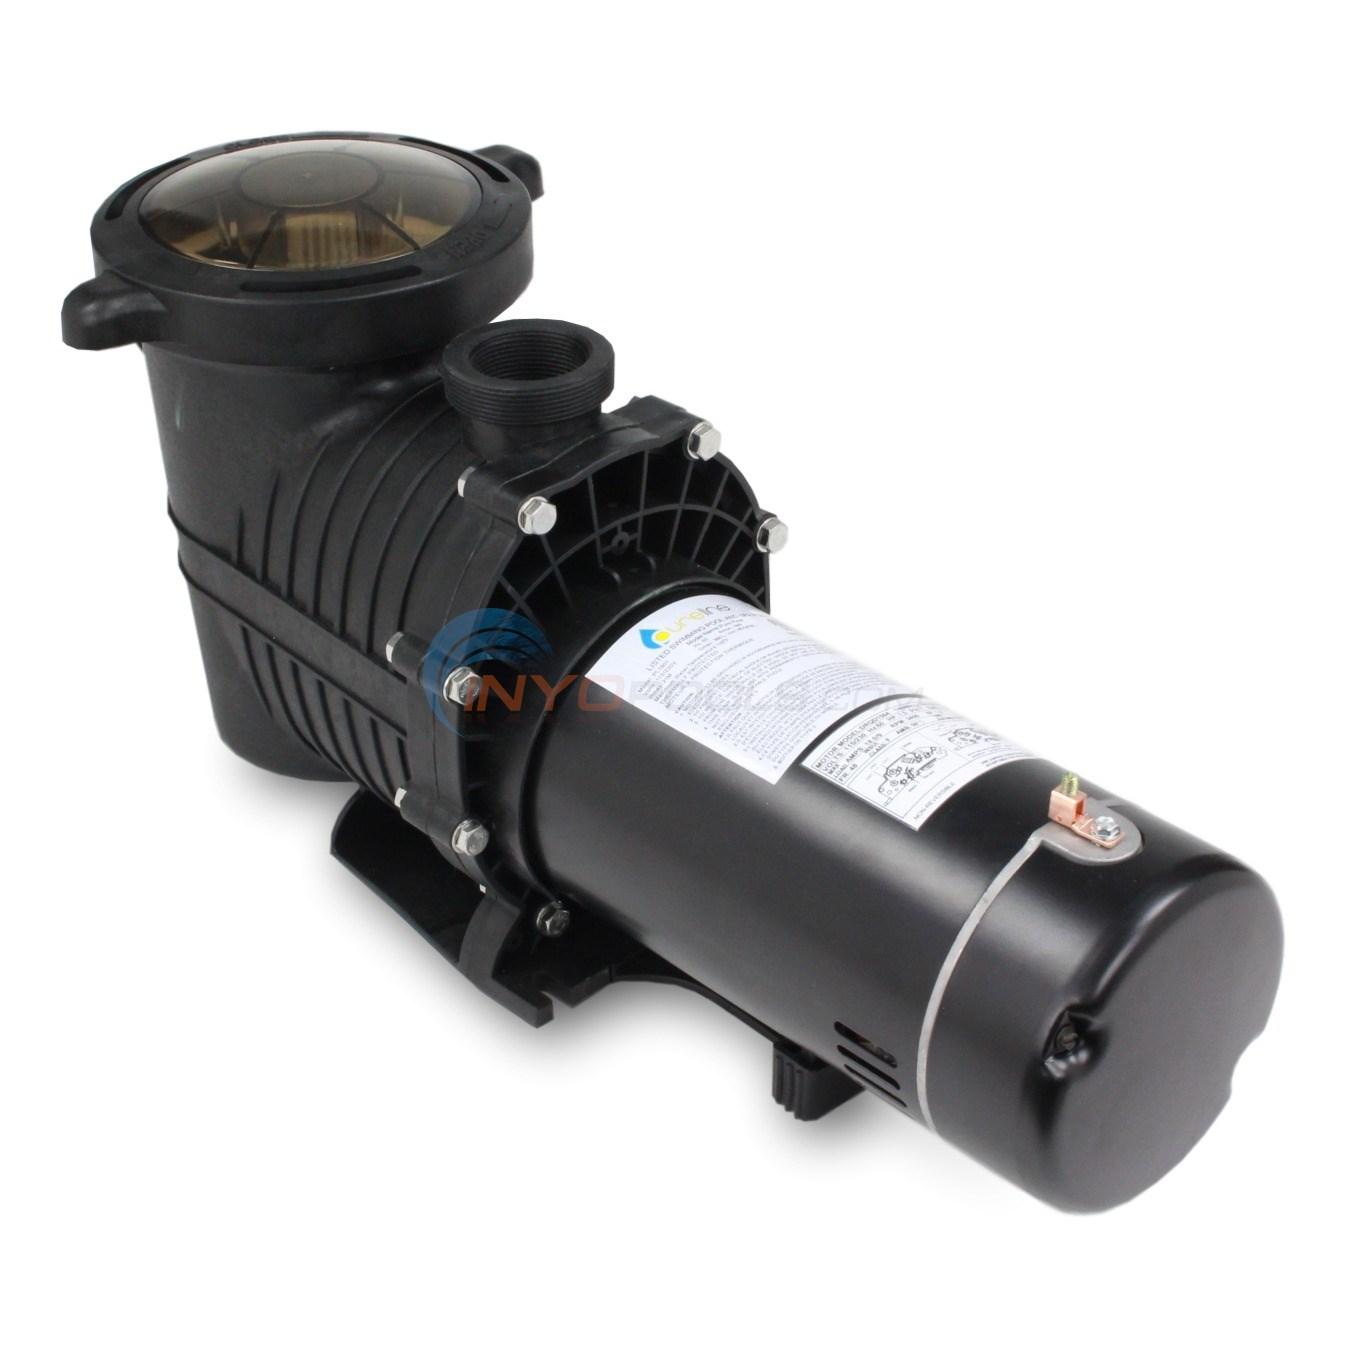 Xtreme 2 Hp Pool Pump Wiring Diagram Best Secret Whisperflo Motor Hayward Power Flo Lx Super Ii Pumps Above